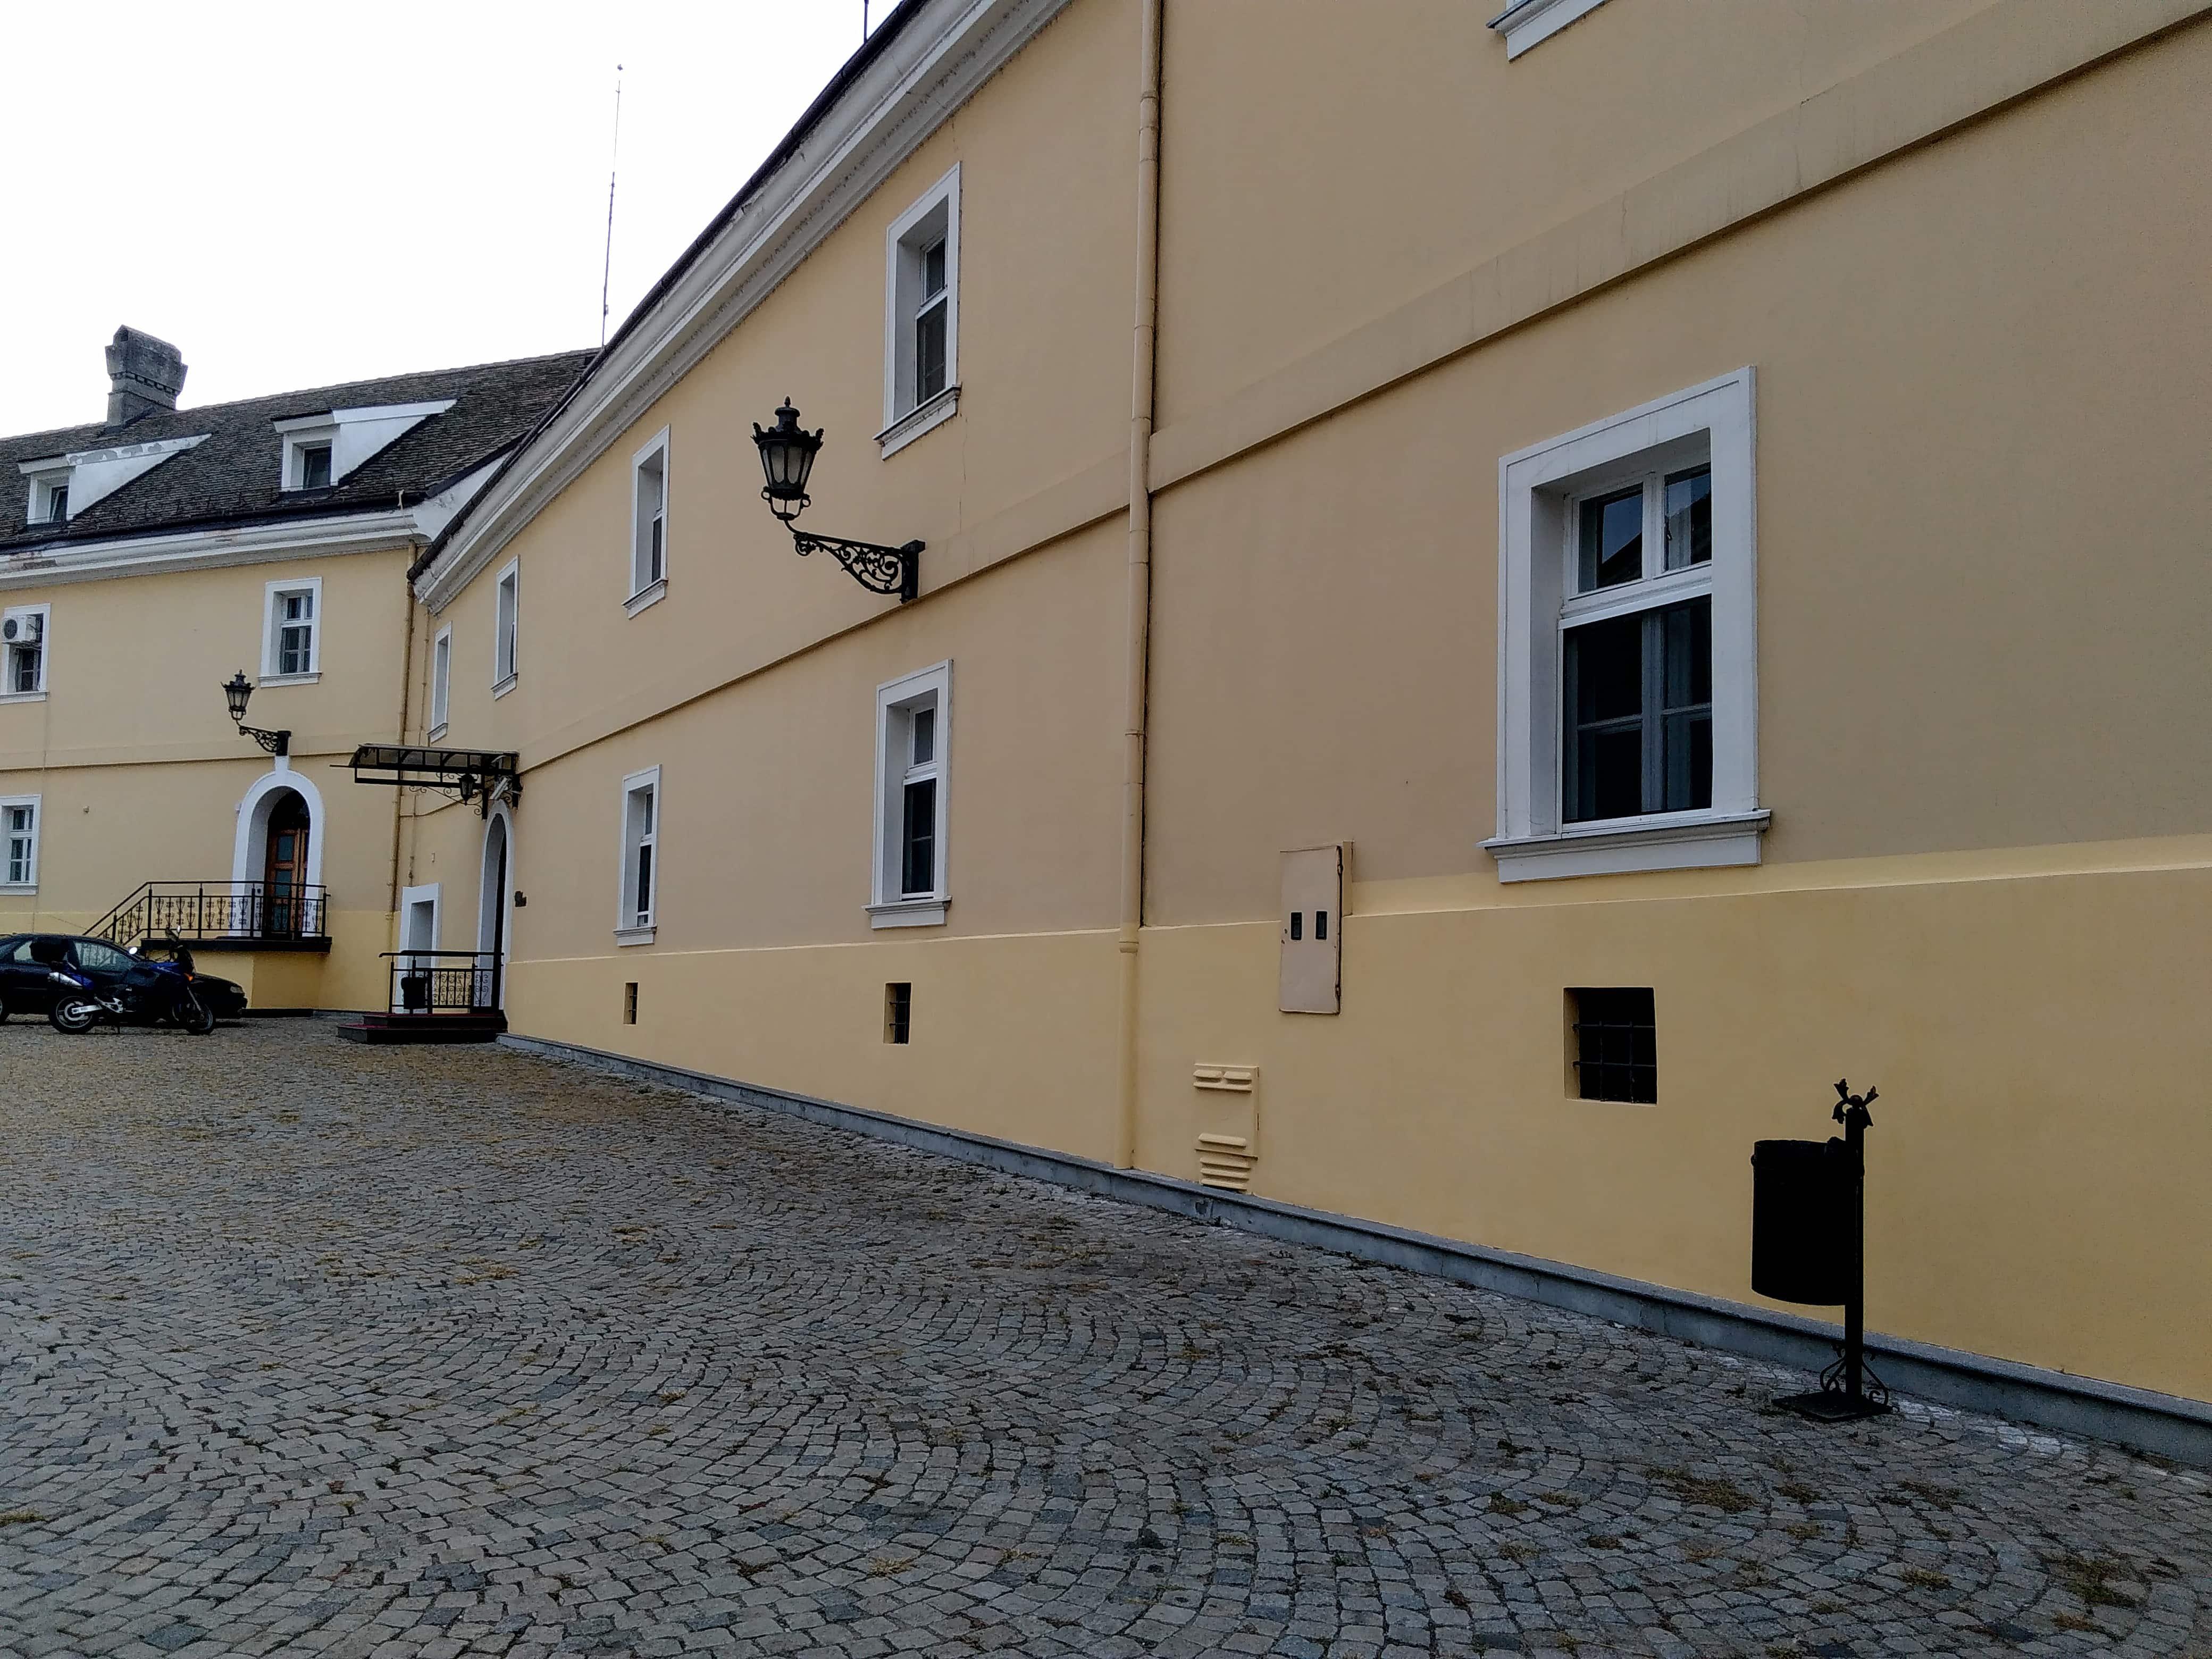 Marciapiedi Esterni Casa : Foto gratis architettura casa facciata strada casa facciata